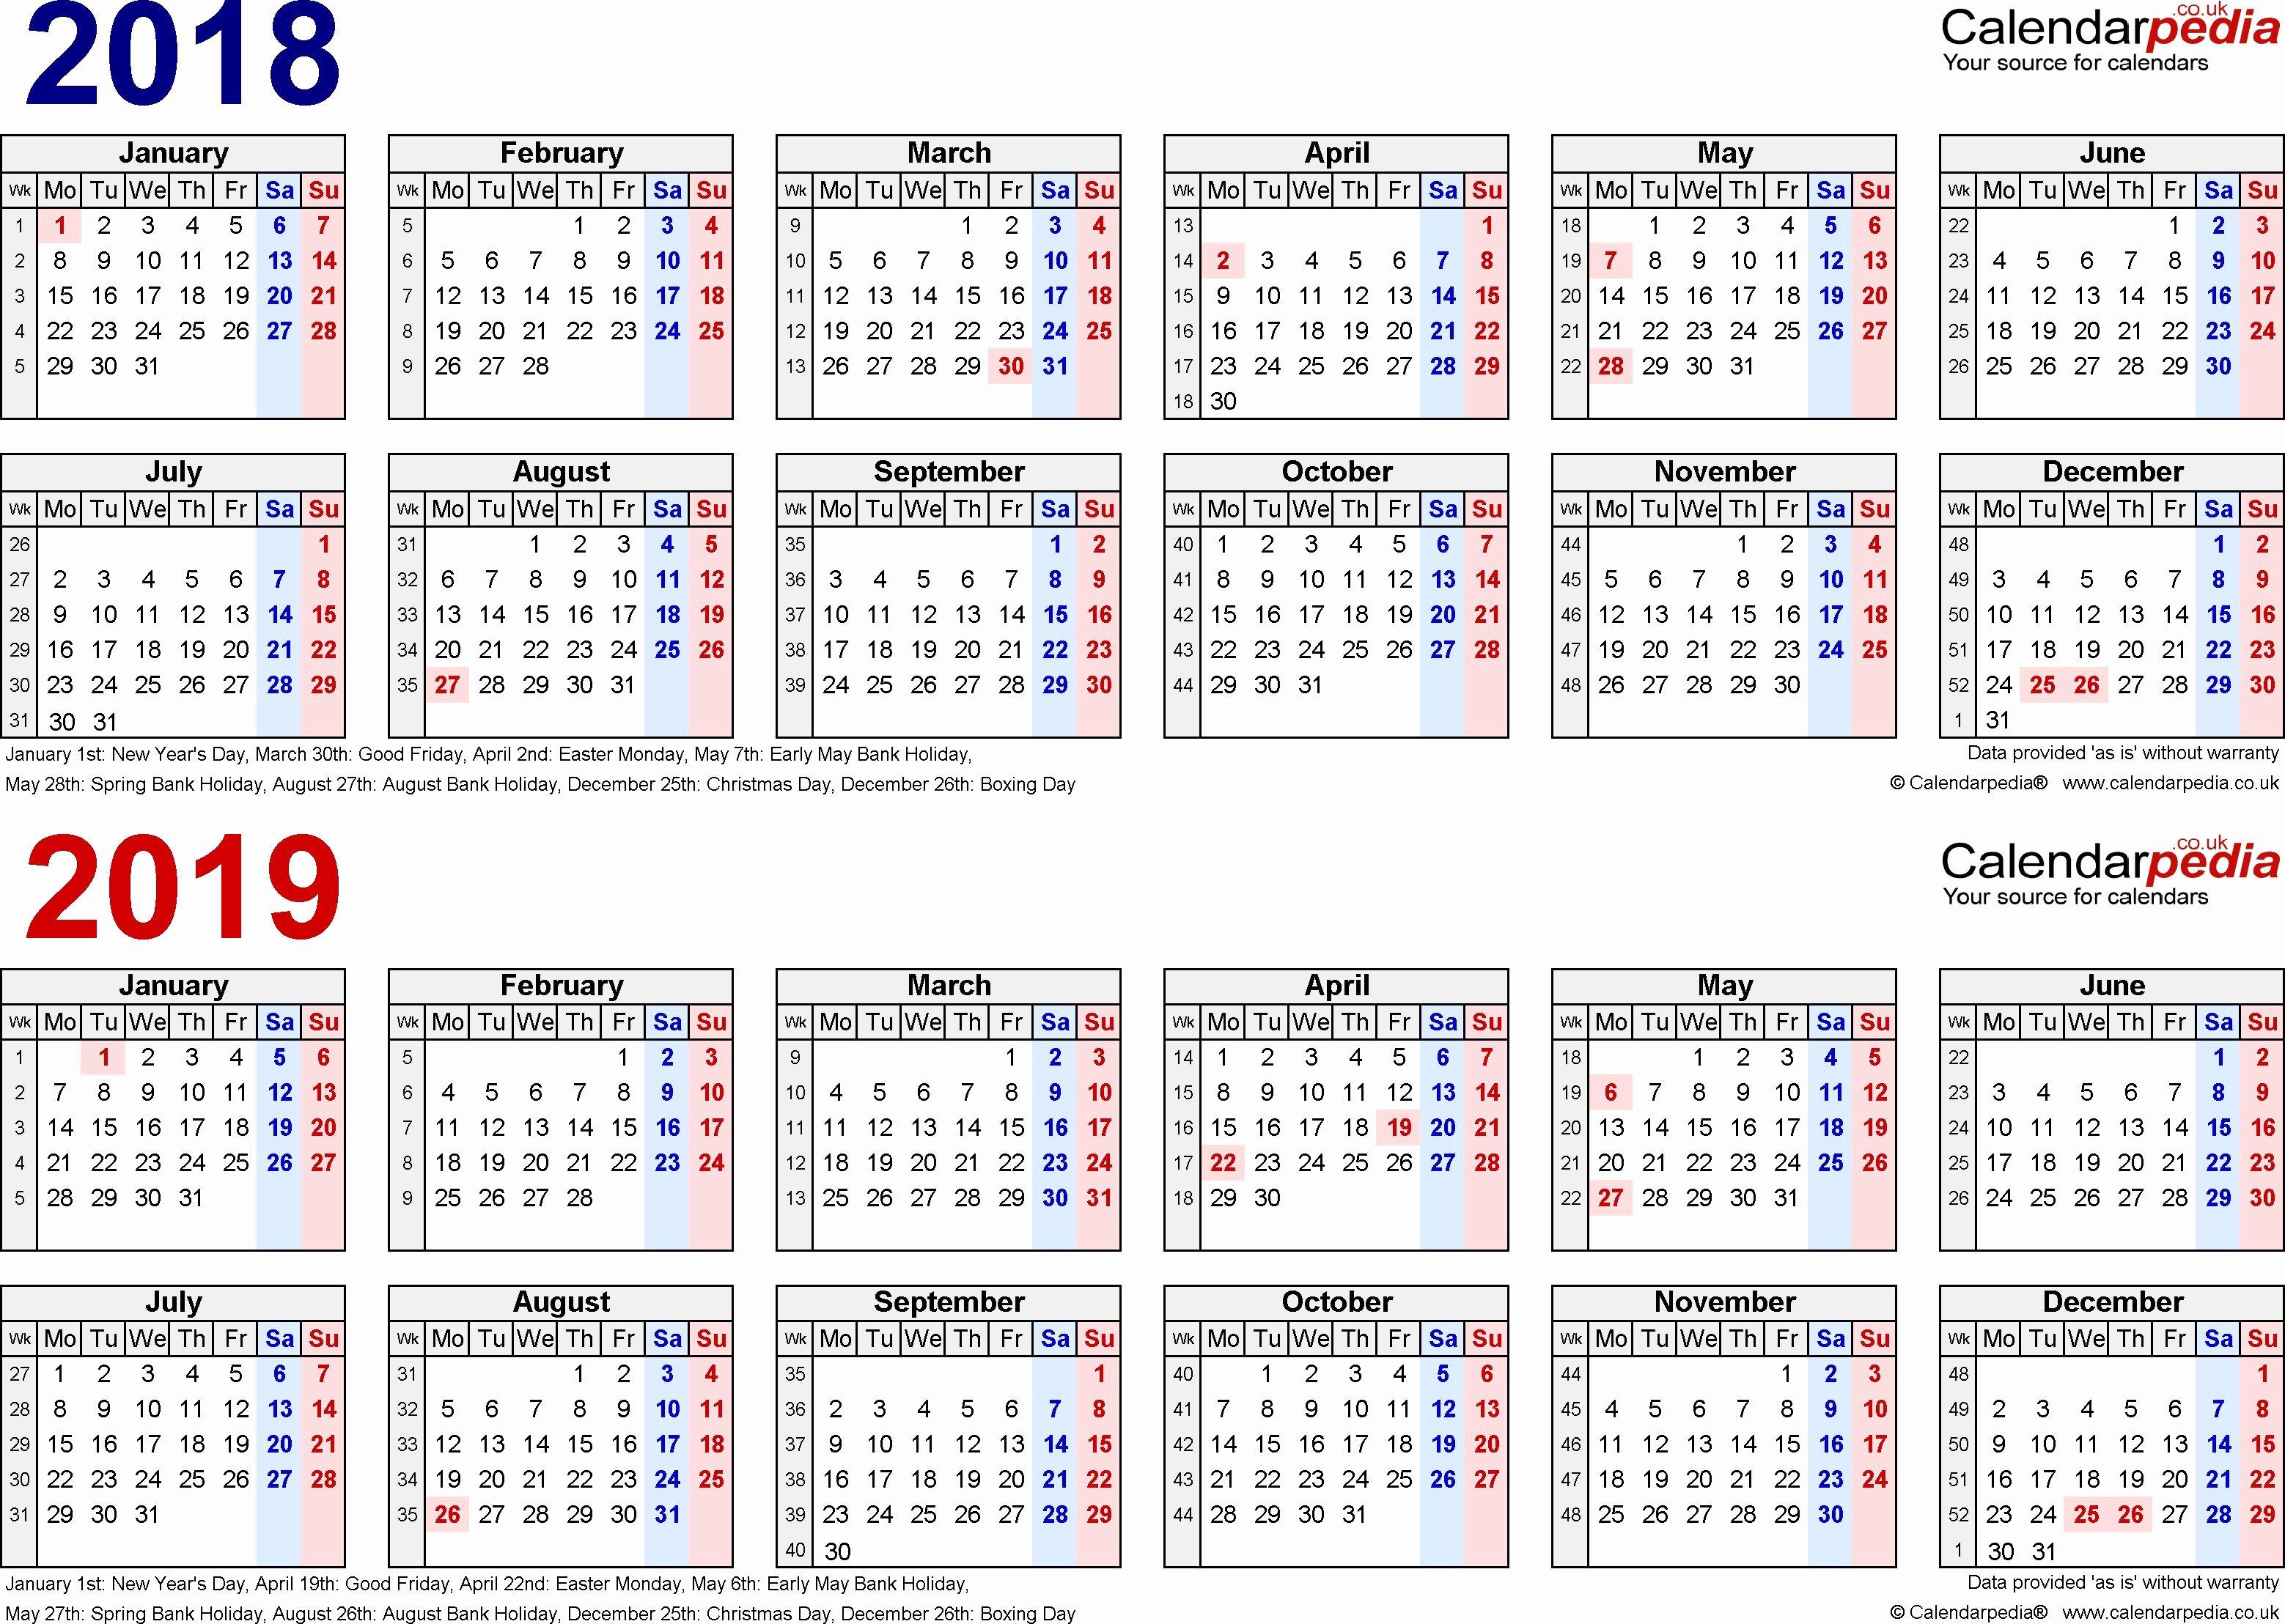 2017 Biweekly Payroll Calendar Template New 2017 Biweekly Payroll Calendar Template Elegant Elegant